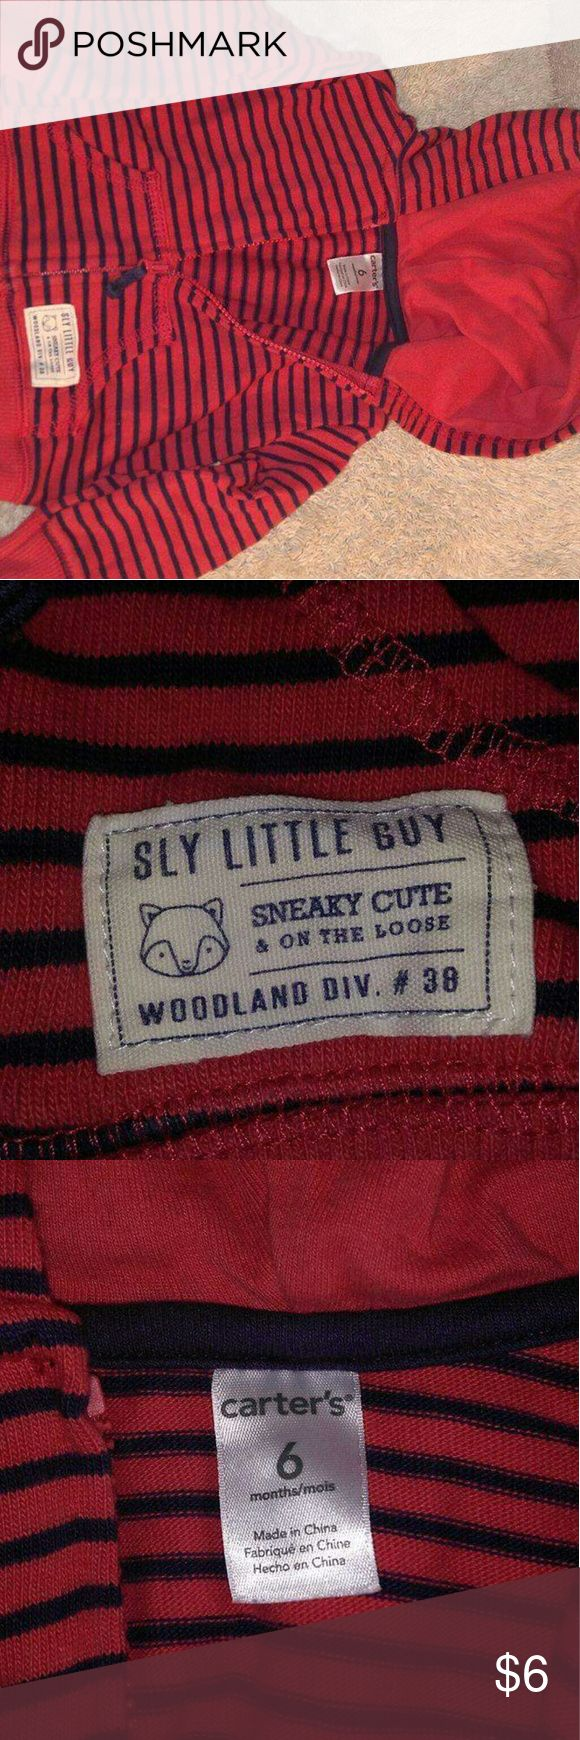 Carters baby hoodie Red and navy blue striped zip up hoodie. Like new Carter's Shirts & Tops Sweatshirts & Hoodies